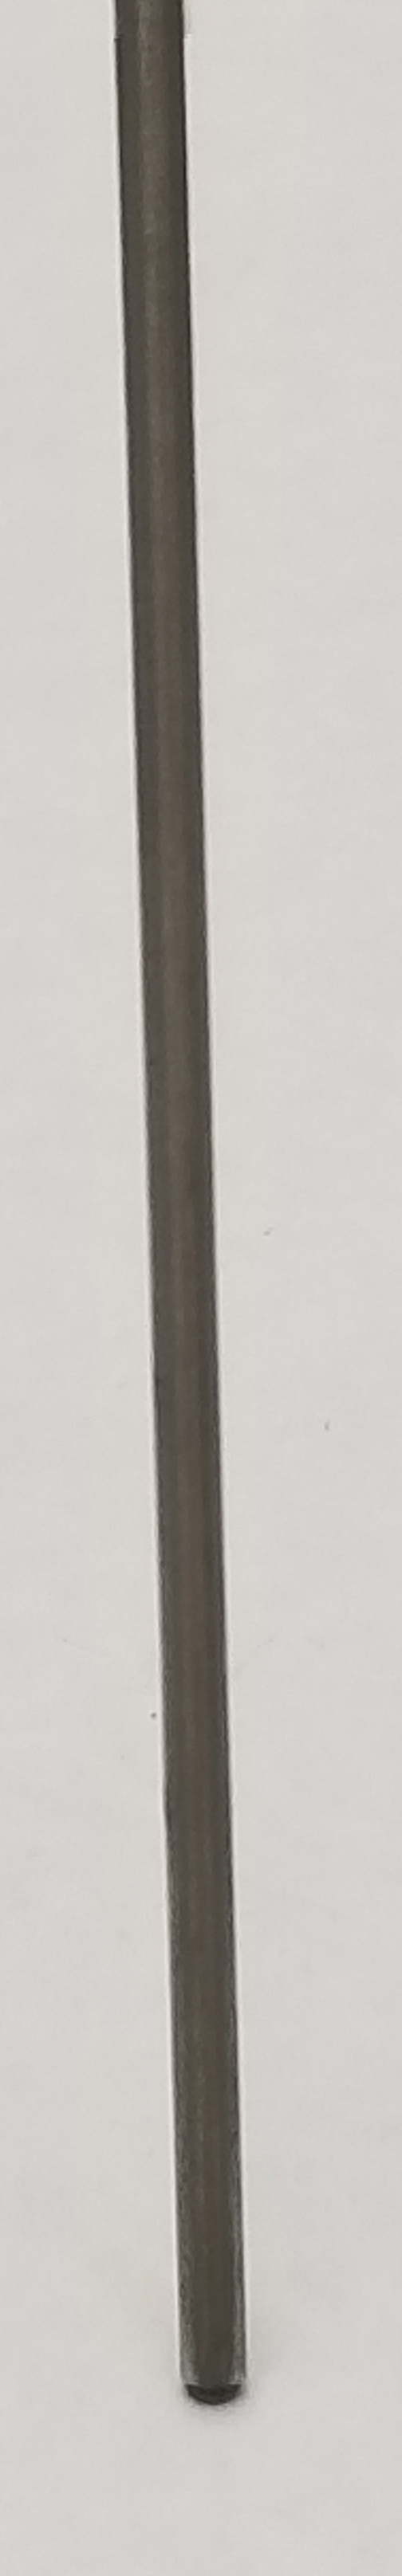 TR41.5 - Van Ordt Replacement Whip Antenna